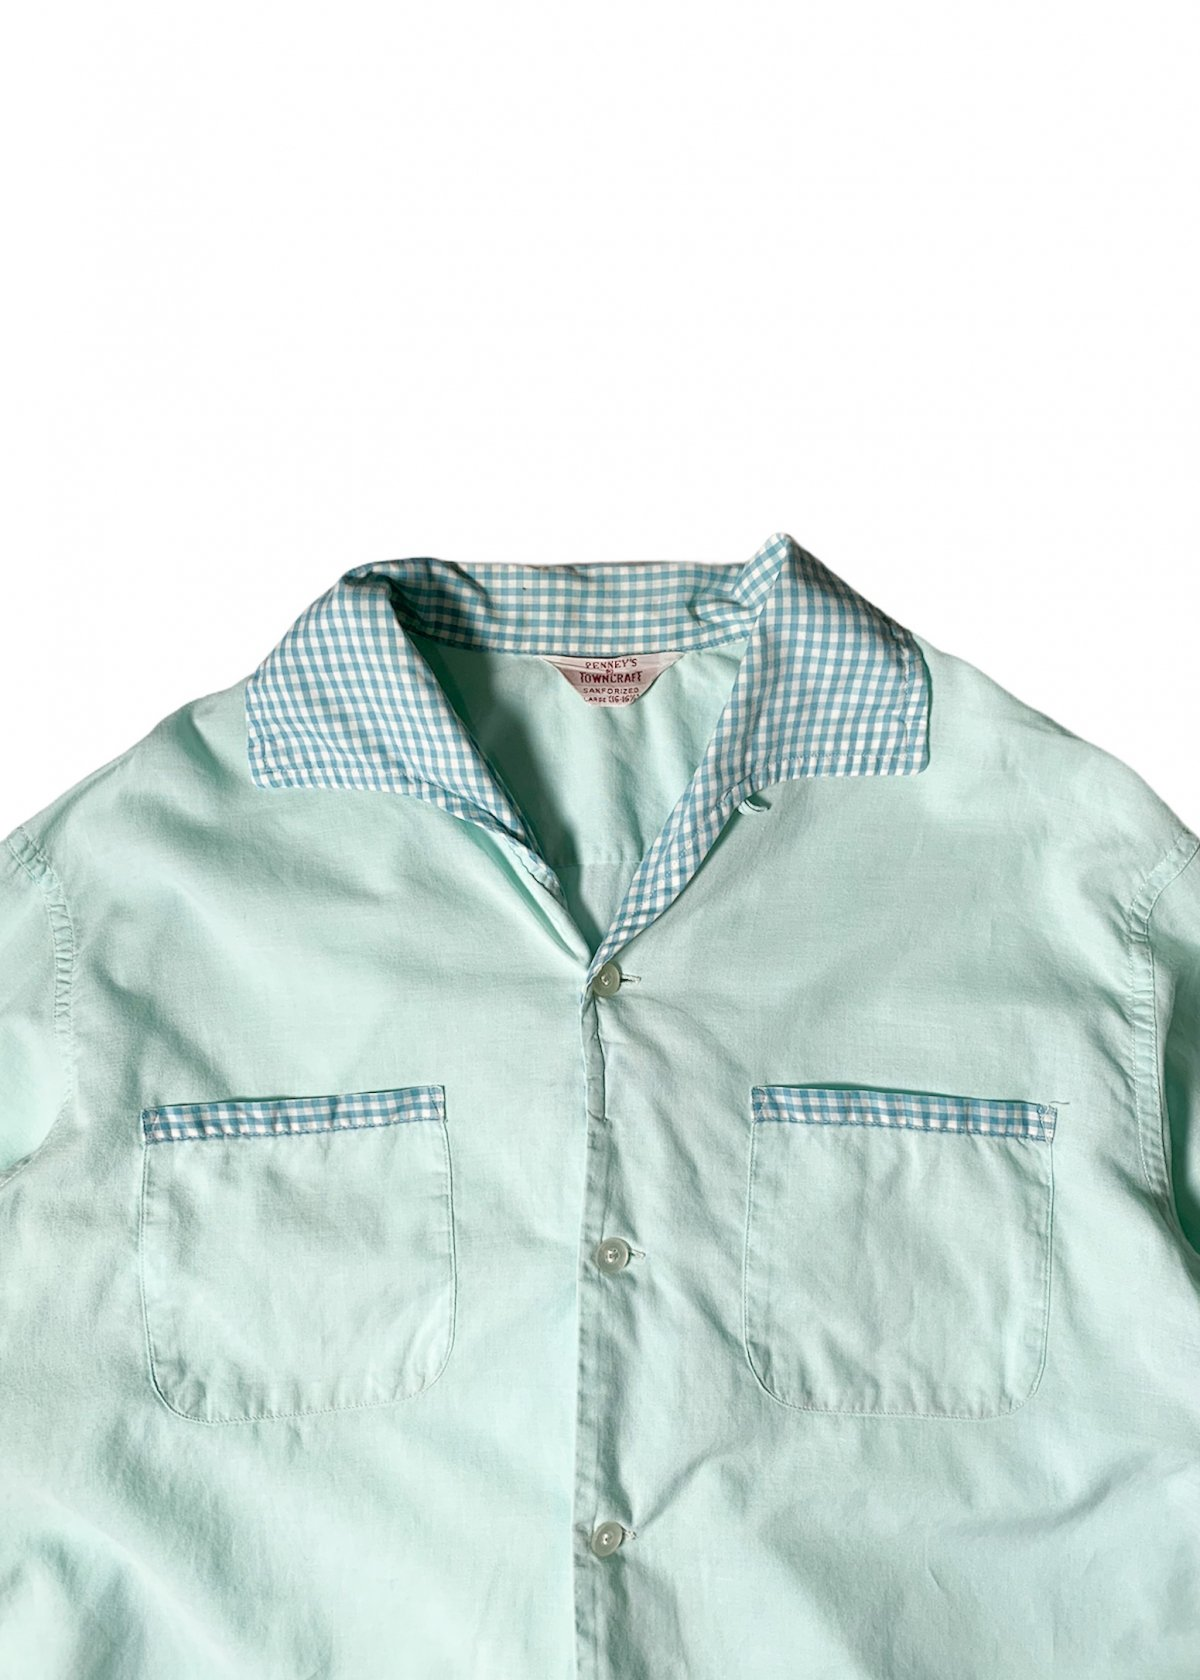 "I&I 古着 通販 ""PENNY'S TOWNCRAFT"" Pajama L/S Shirt 詳細画像2"